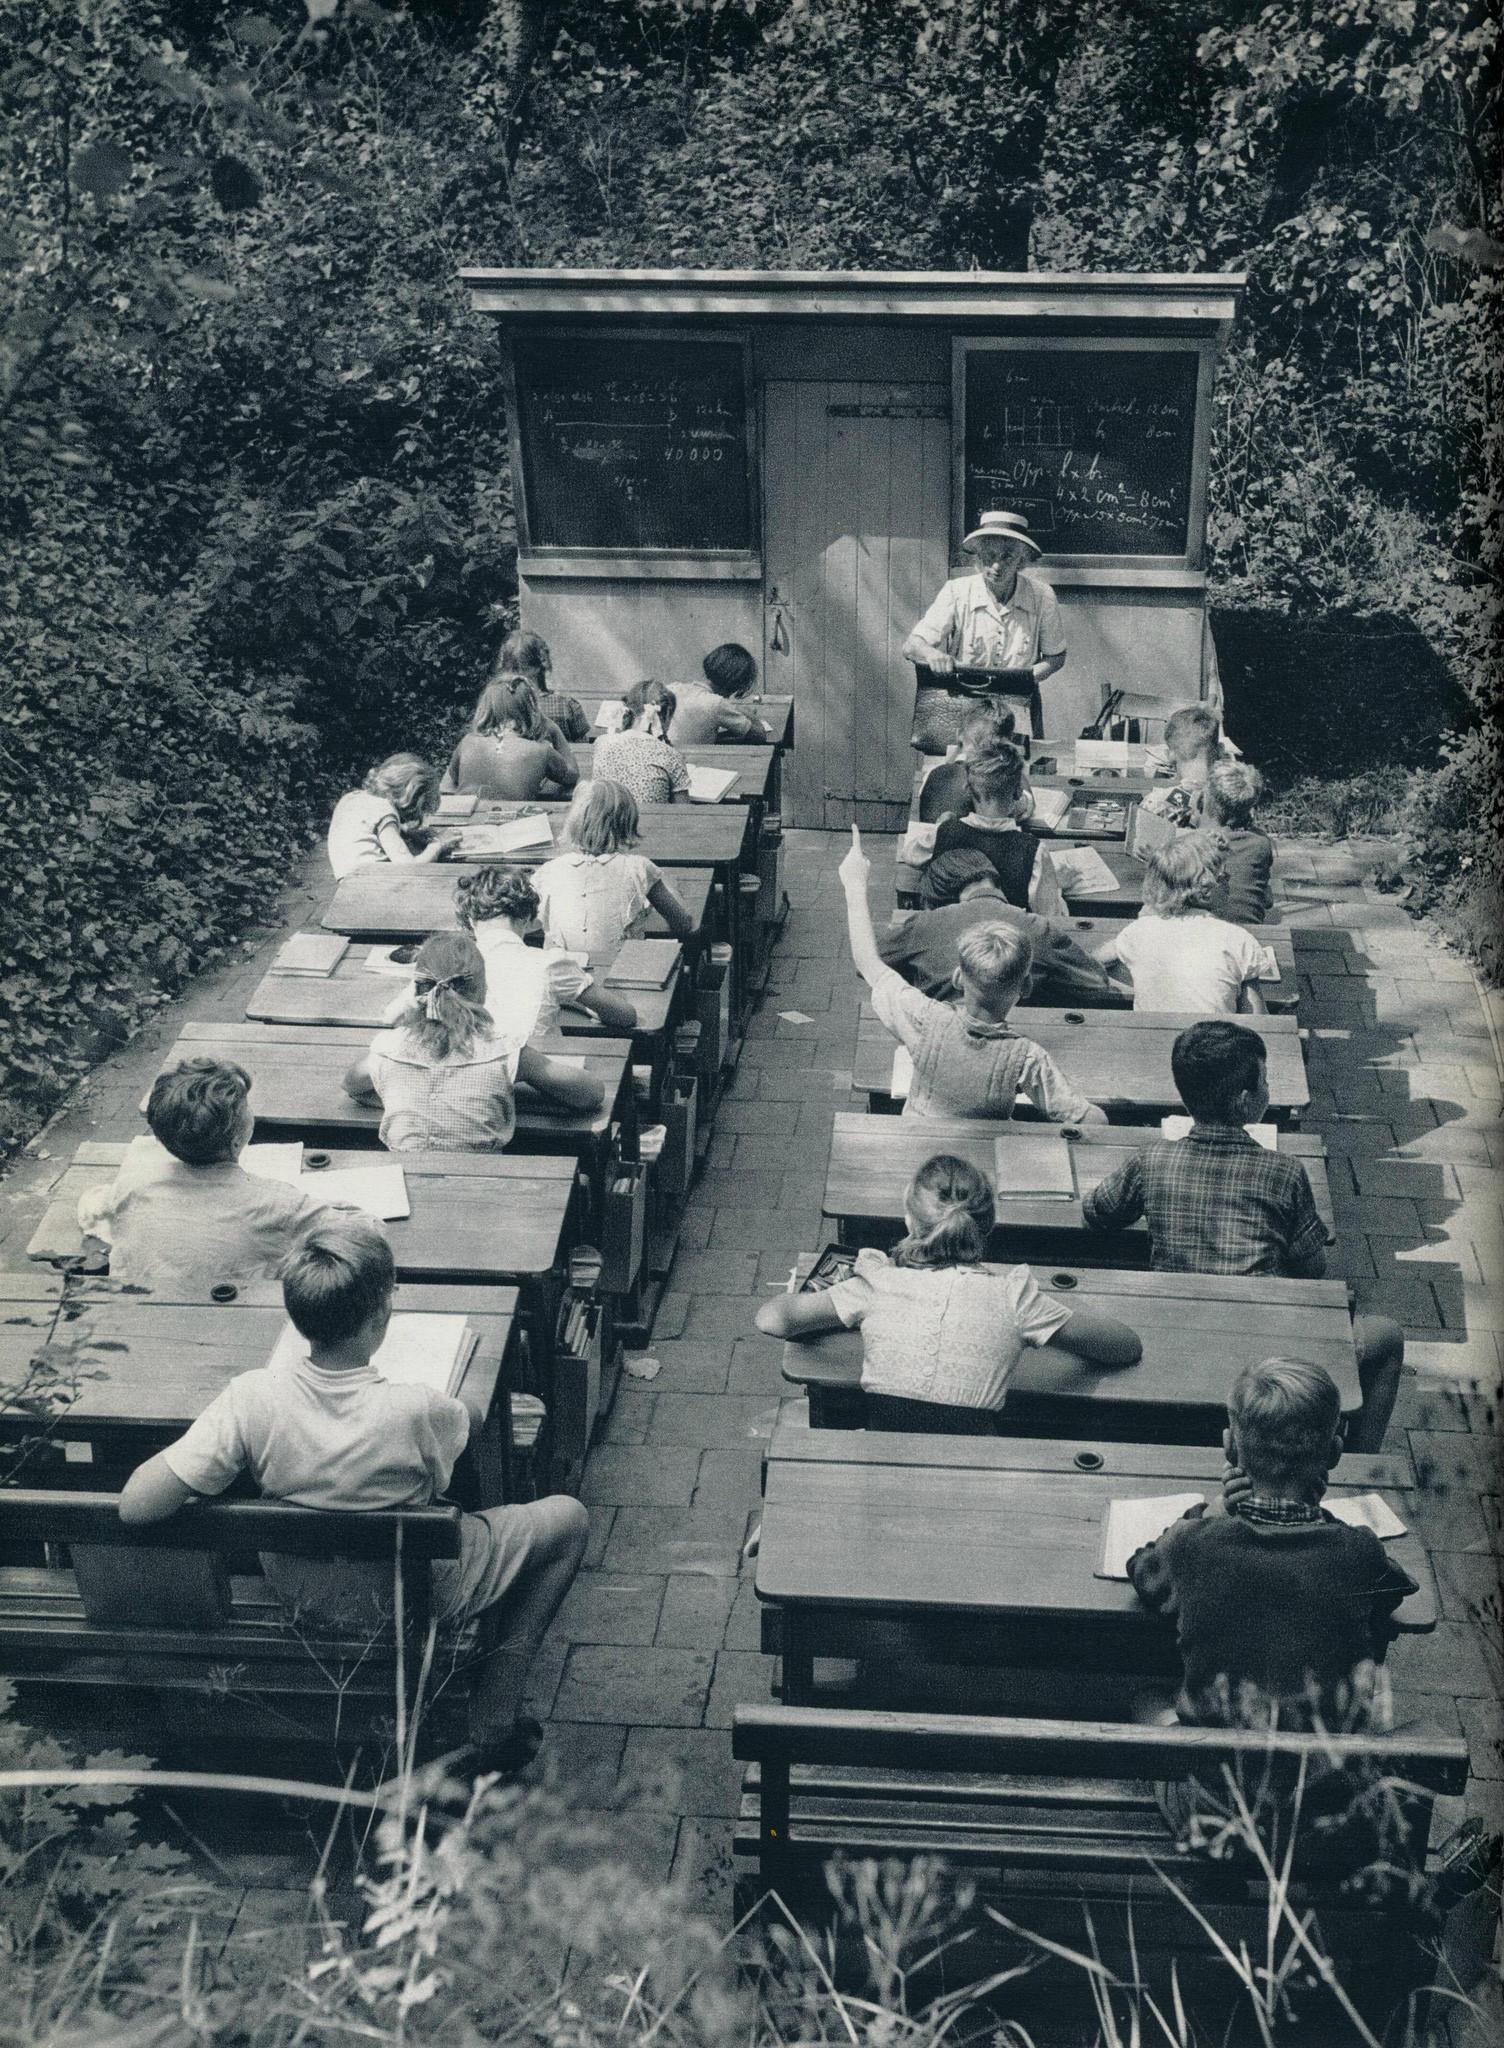 outdoorschoolnetherlands.jpg